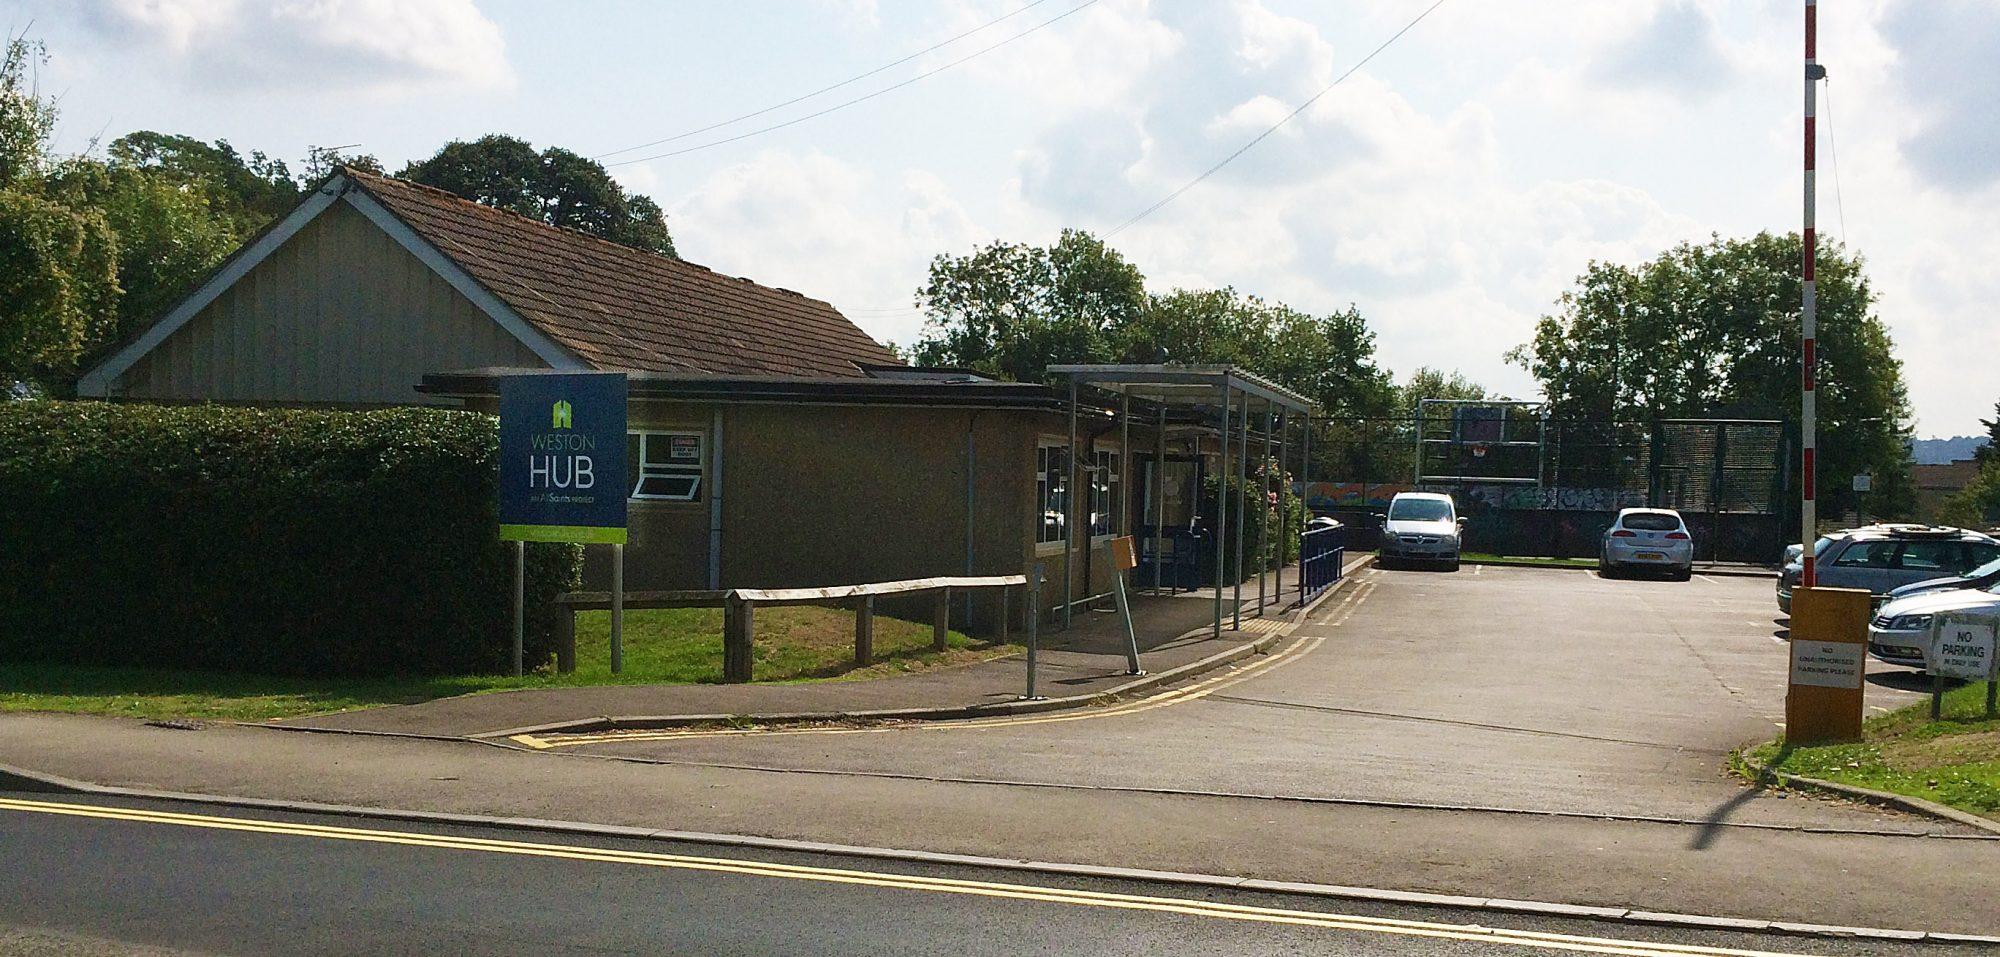 Photo of New Life antenatal classes venue in Bath - Weston Hub